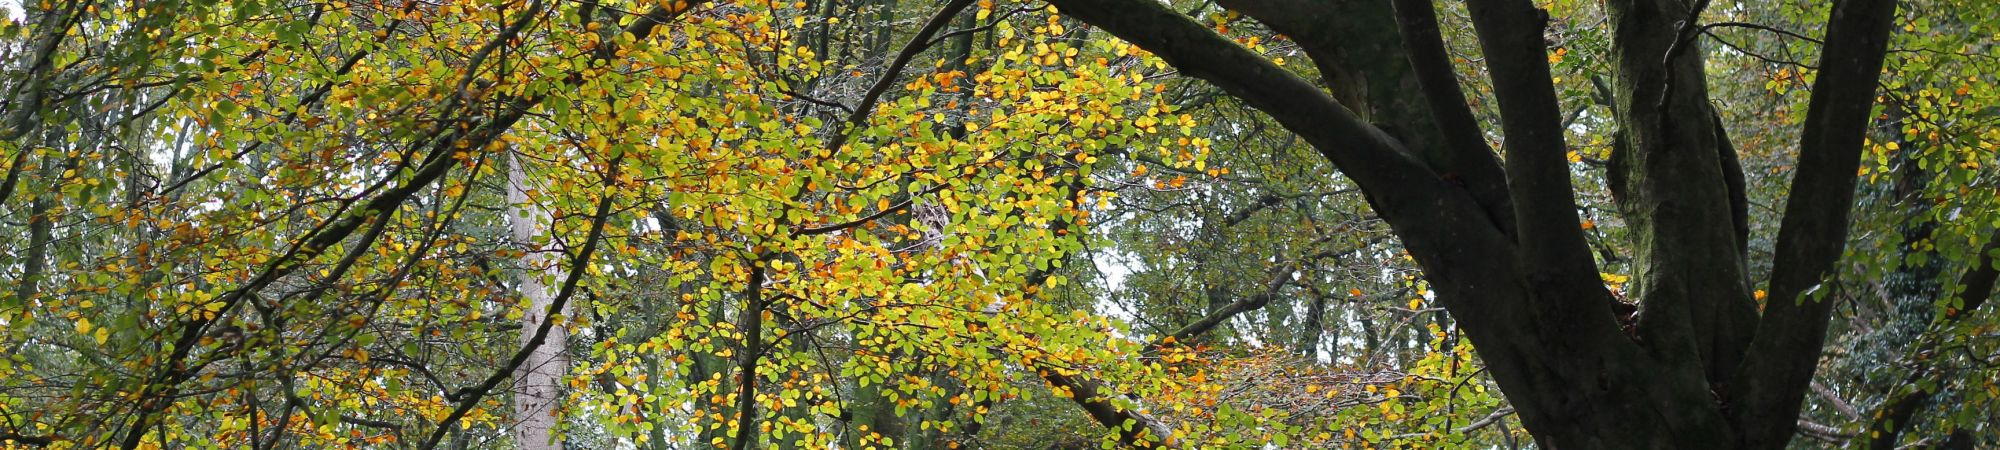 Crenver Woods - Autumn in Cornwall